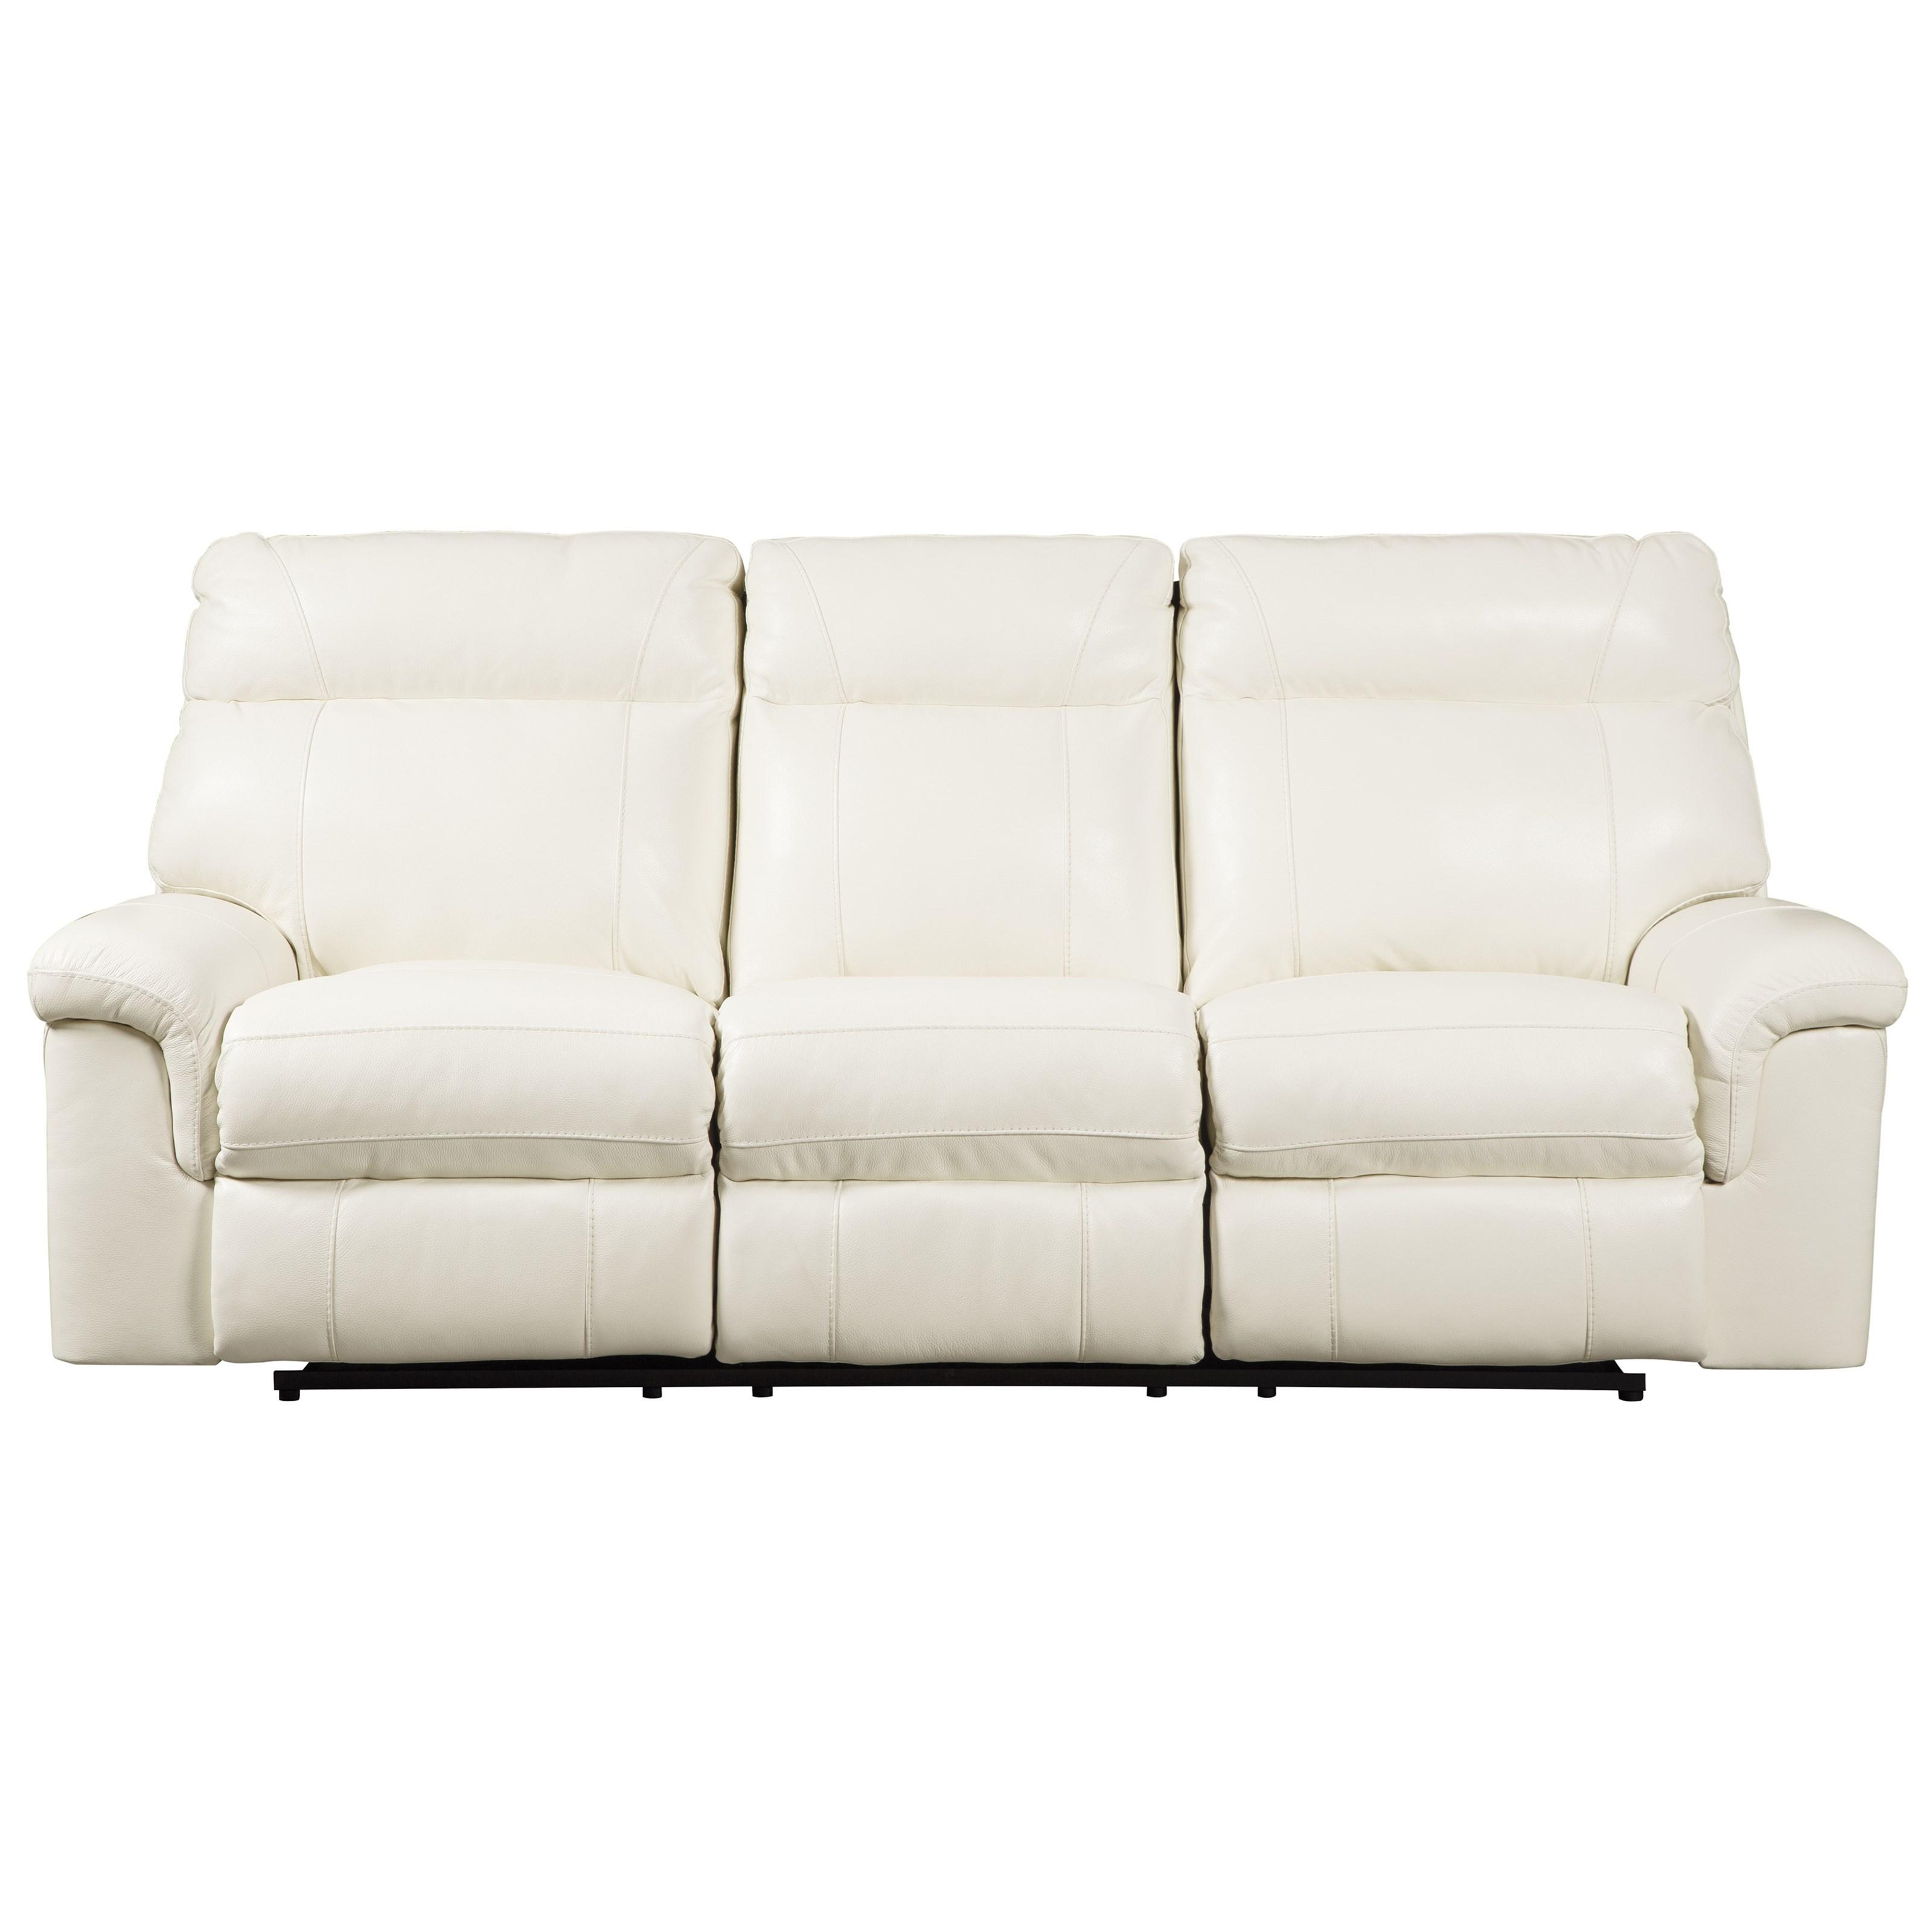 Millennium Whiteville Power Reclining Sofa w/ Adjustable Headrest - Item Number: 1900215